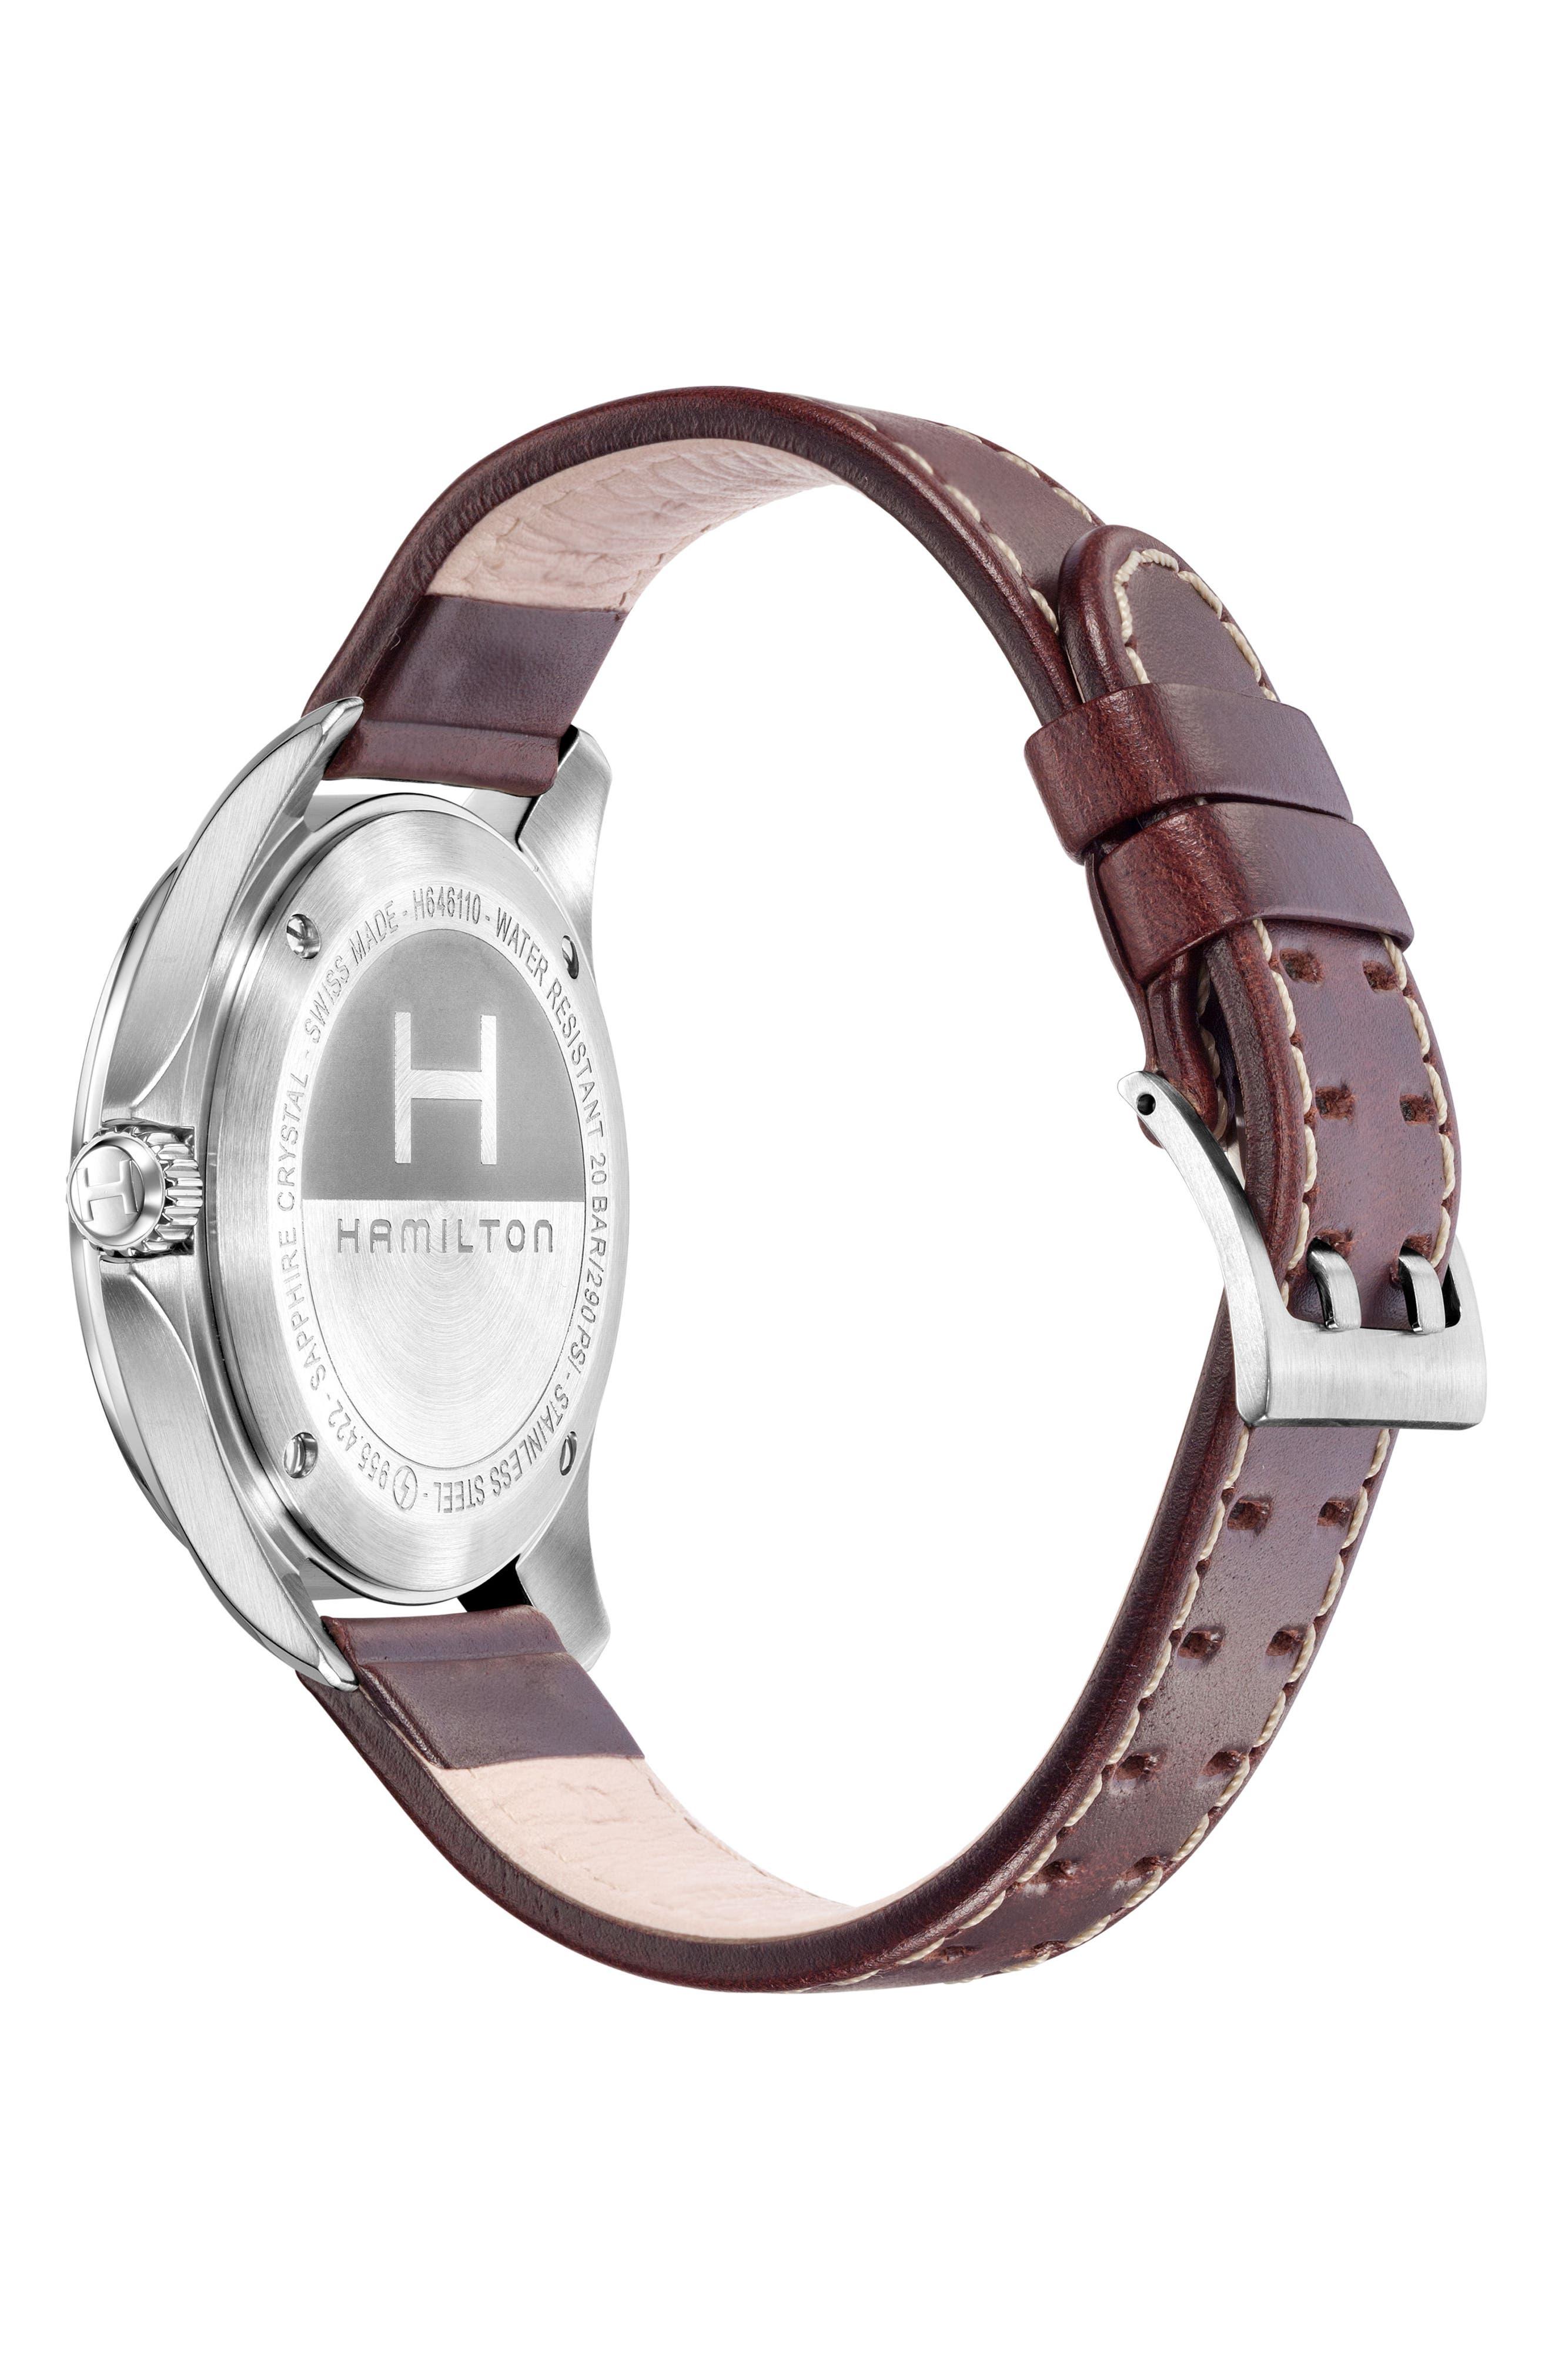 Khaki Aviation Pilot Leather Strap Watch, 42mm,                             Alternate thumbnail 2, color,                             Brown/ Black/ Silver